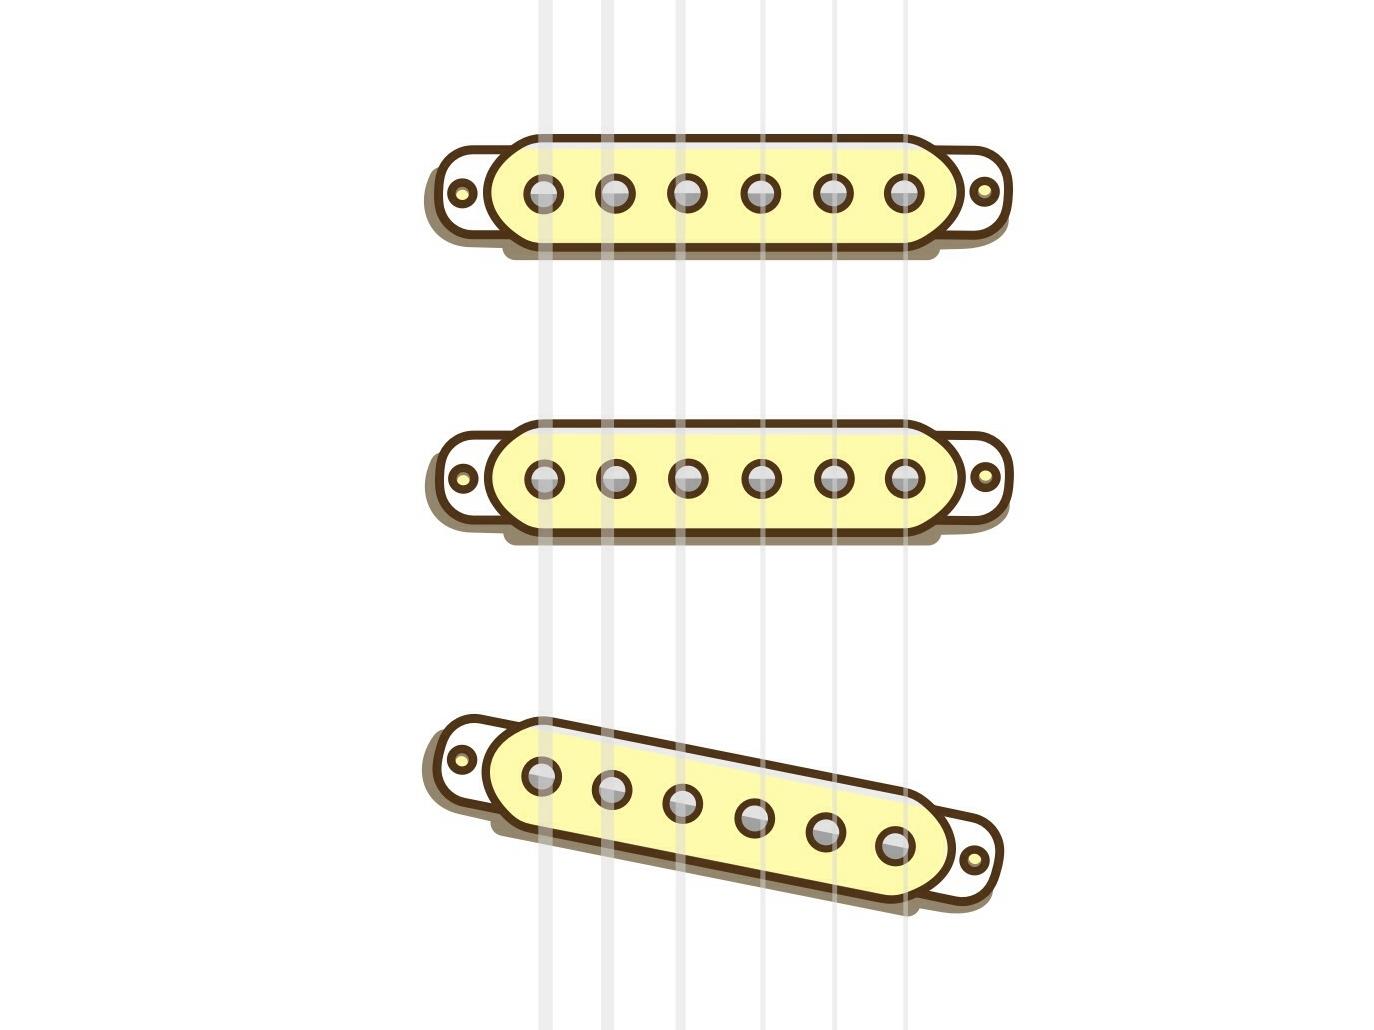 Fender Stratocaster vintage retro play band musician brand usa music rock sound audio humbucking electric guitar guitarist guitar pickup stratocaster fender 2d illustration